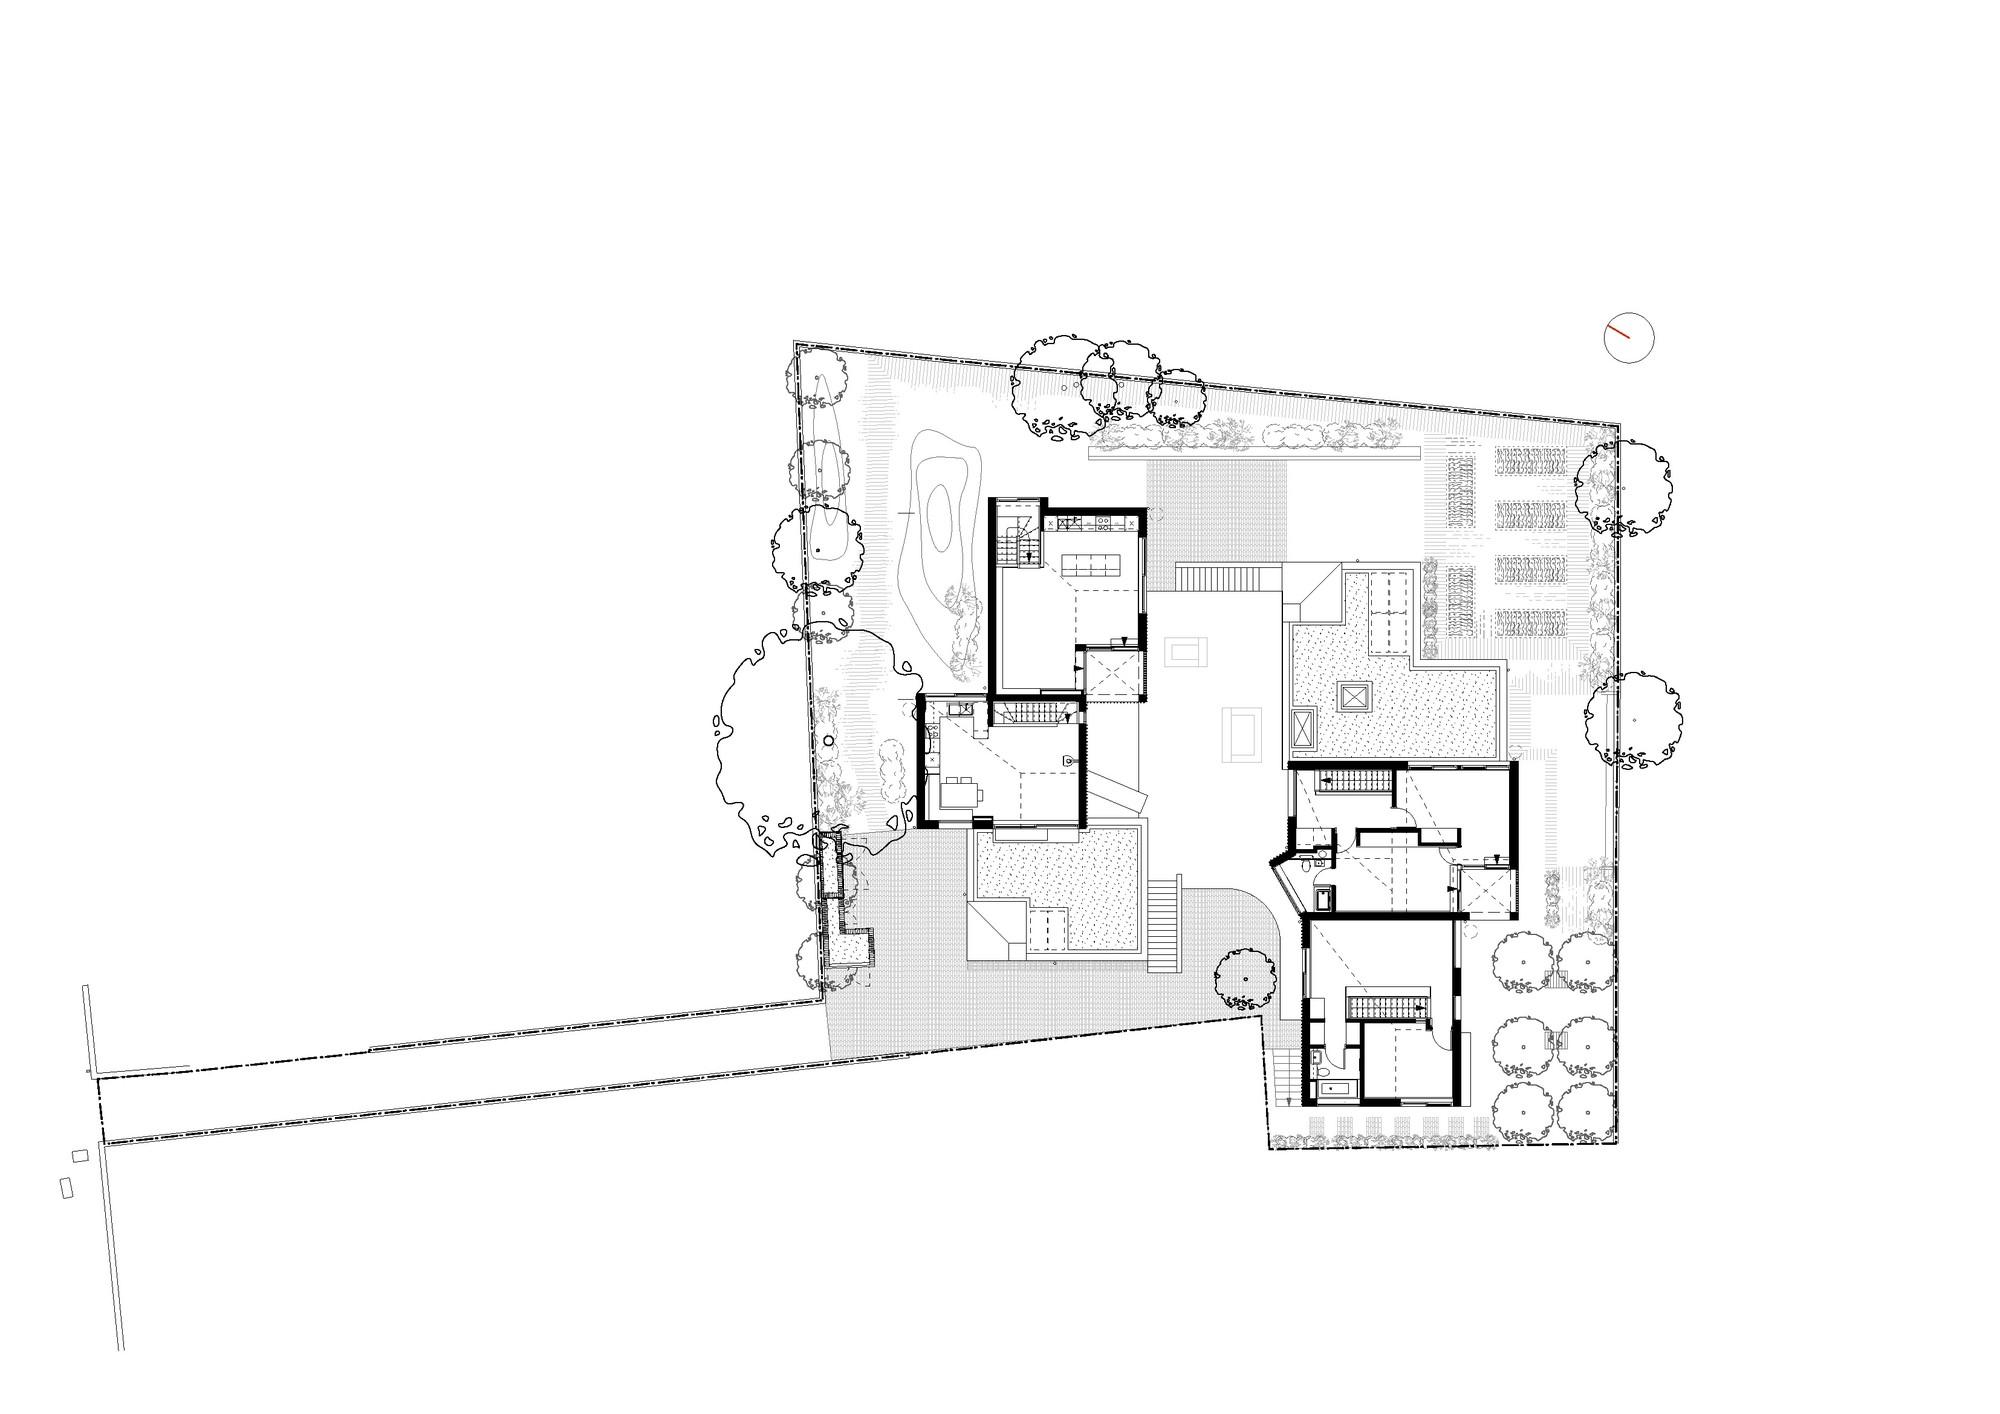 1 6 copper lane n16 9ns henley halebrown rorrison for 16 brookers lane floor plans